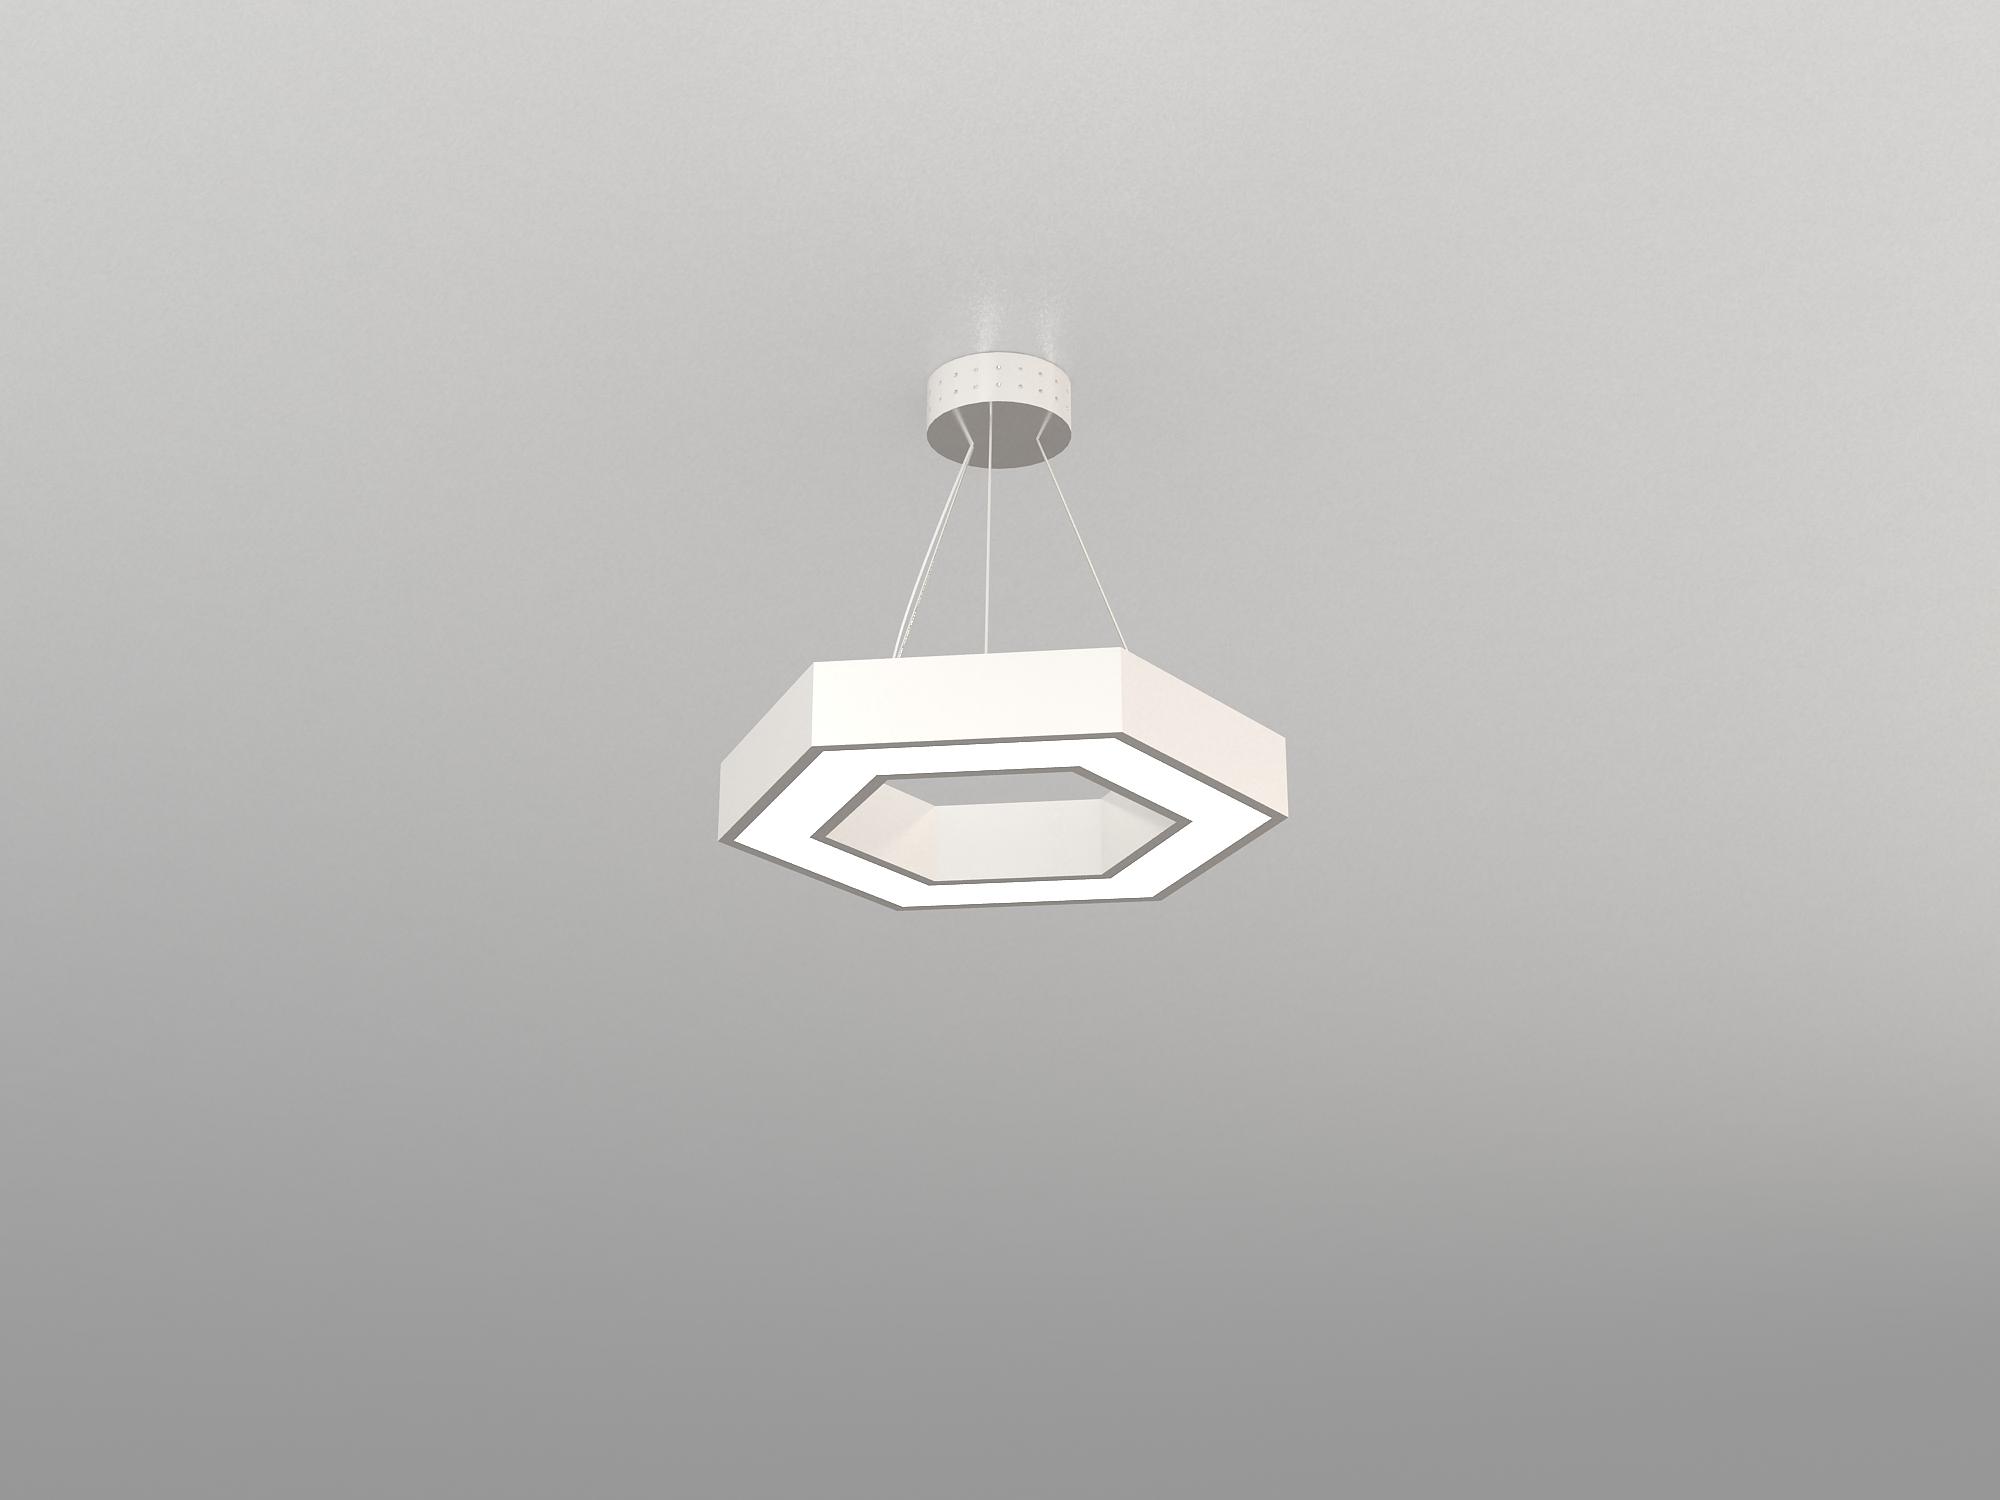 ARCHITECTURAL LIGHT - HEXAGON SERIES